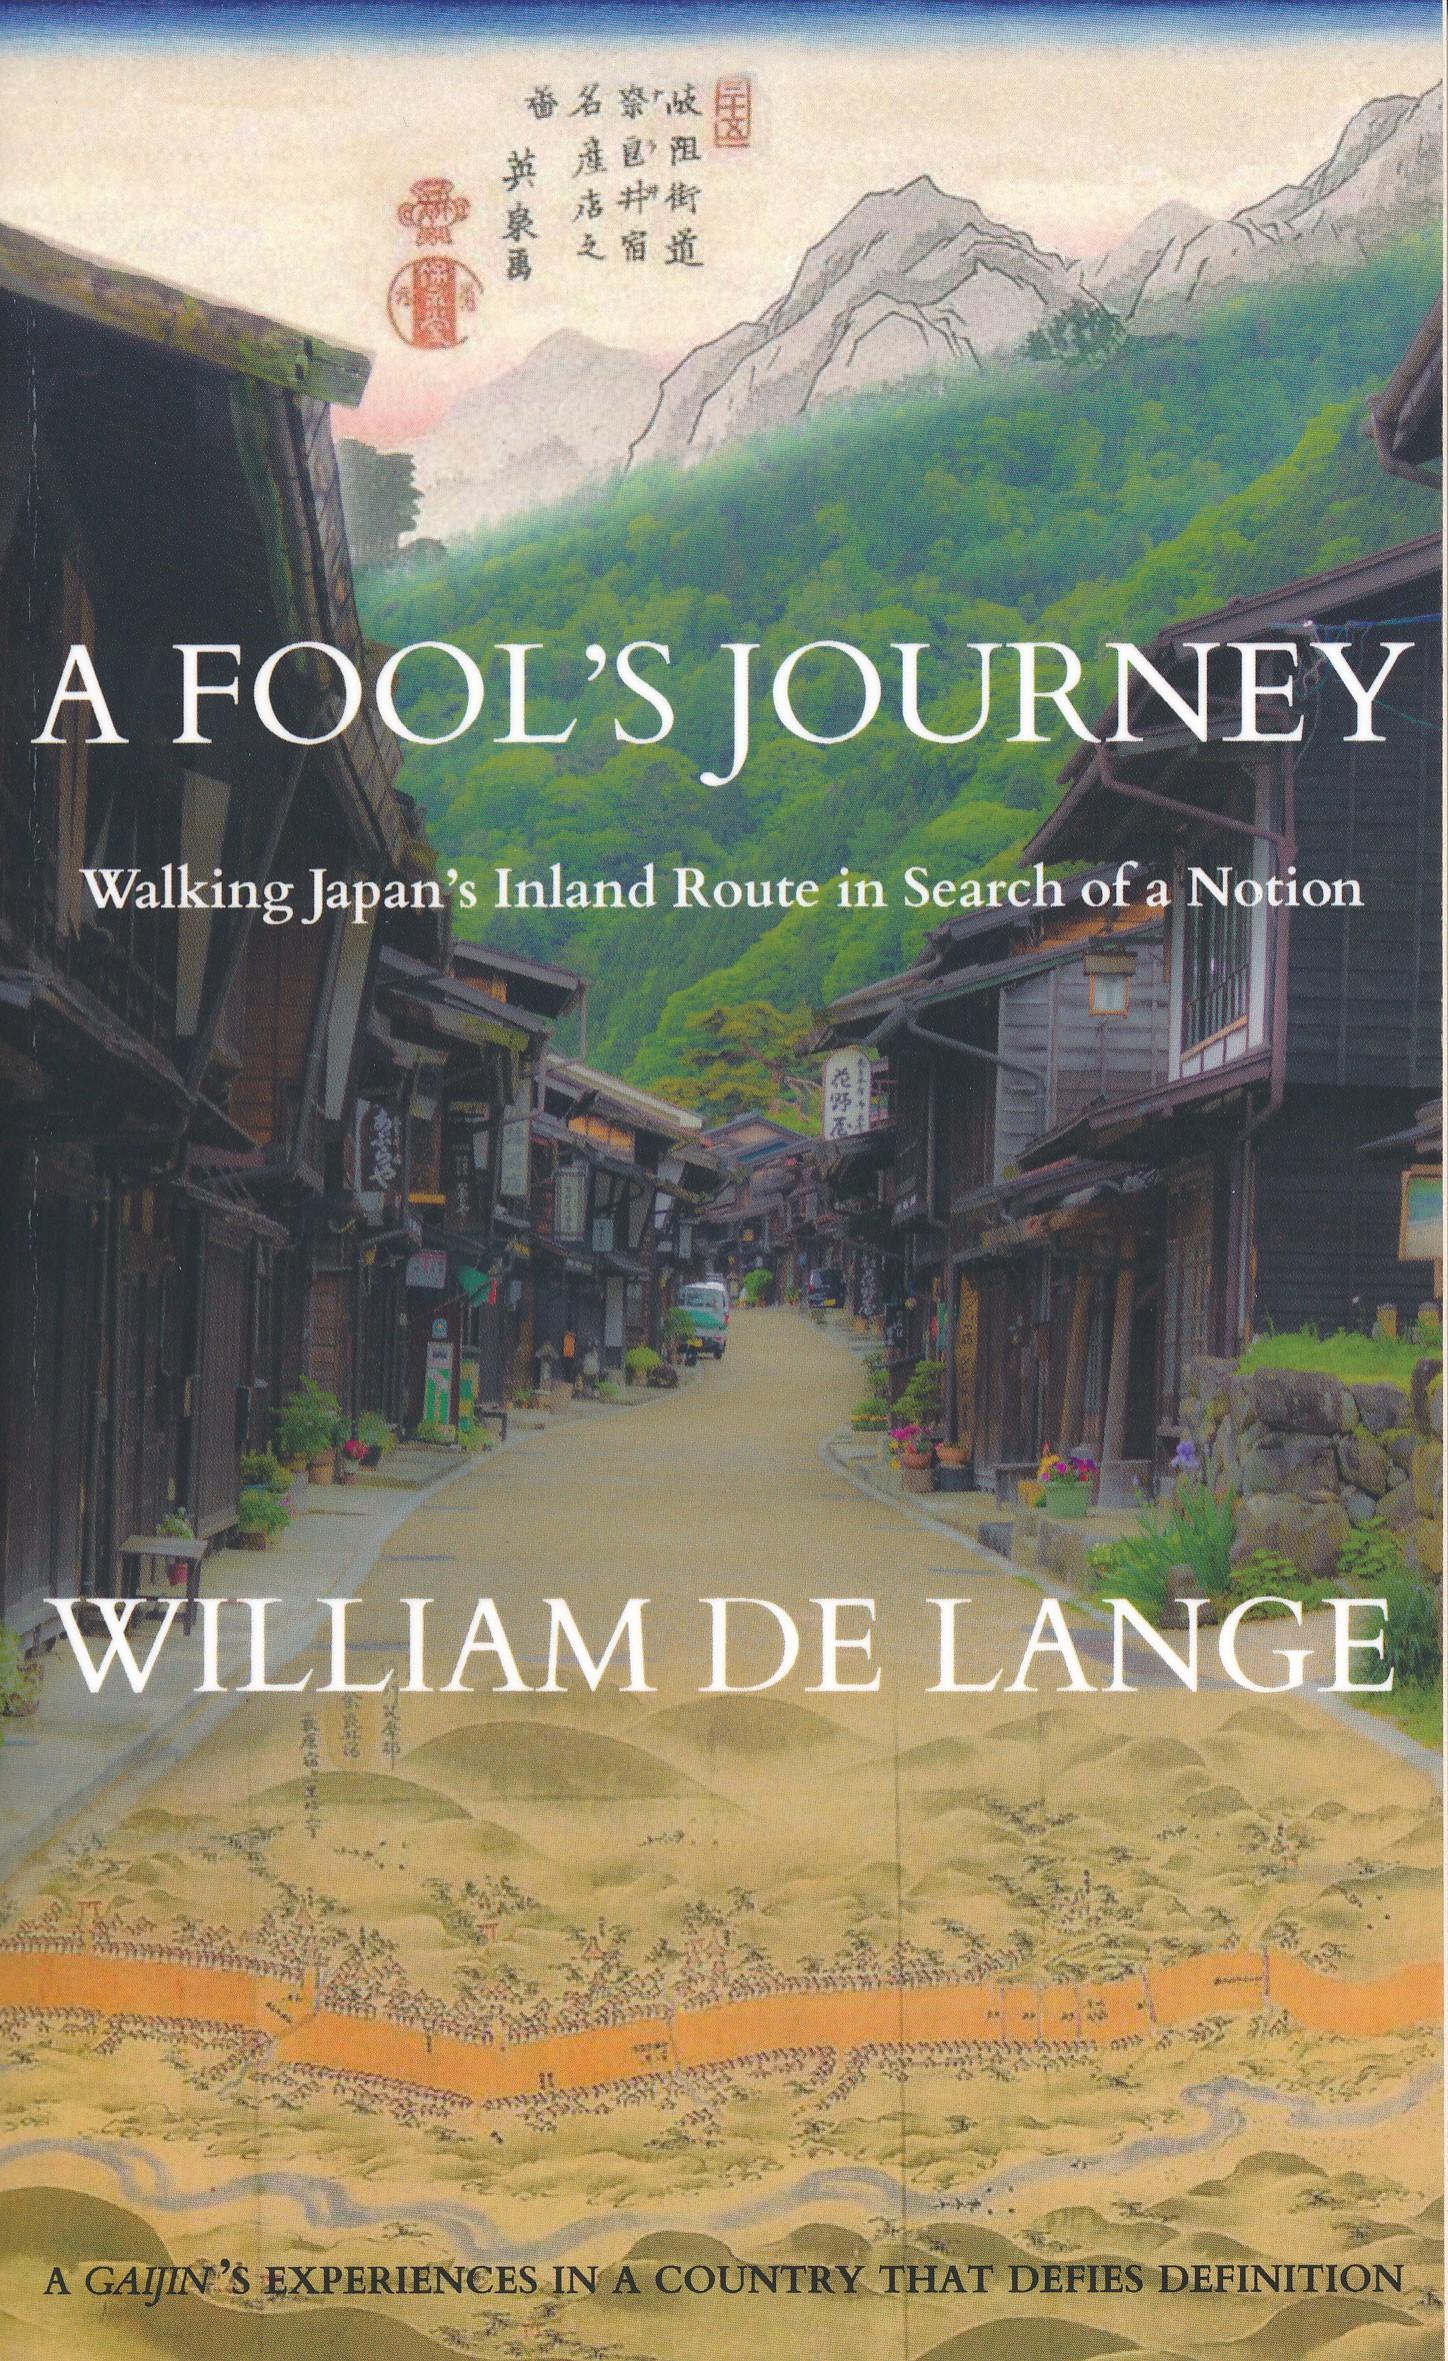 Reisverhaal A Fool's Journey | William De Lange <br/>€ 10.50 <br/> <a href='https://www.dezwerver.nl/reisgidsen/?tt=1554_252853_241358_&r=https%3A%2F%2Fwww.dezwerver.nl%2Fr%2Fazie%2Fjapan%2Fc%2Fboeken%2Freisverhalen%2F9789492722058%2Freisverhaal-a-fools-journey-william-de-lange%2F' target='_blank'>Meer Info</a>